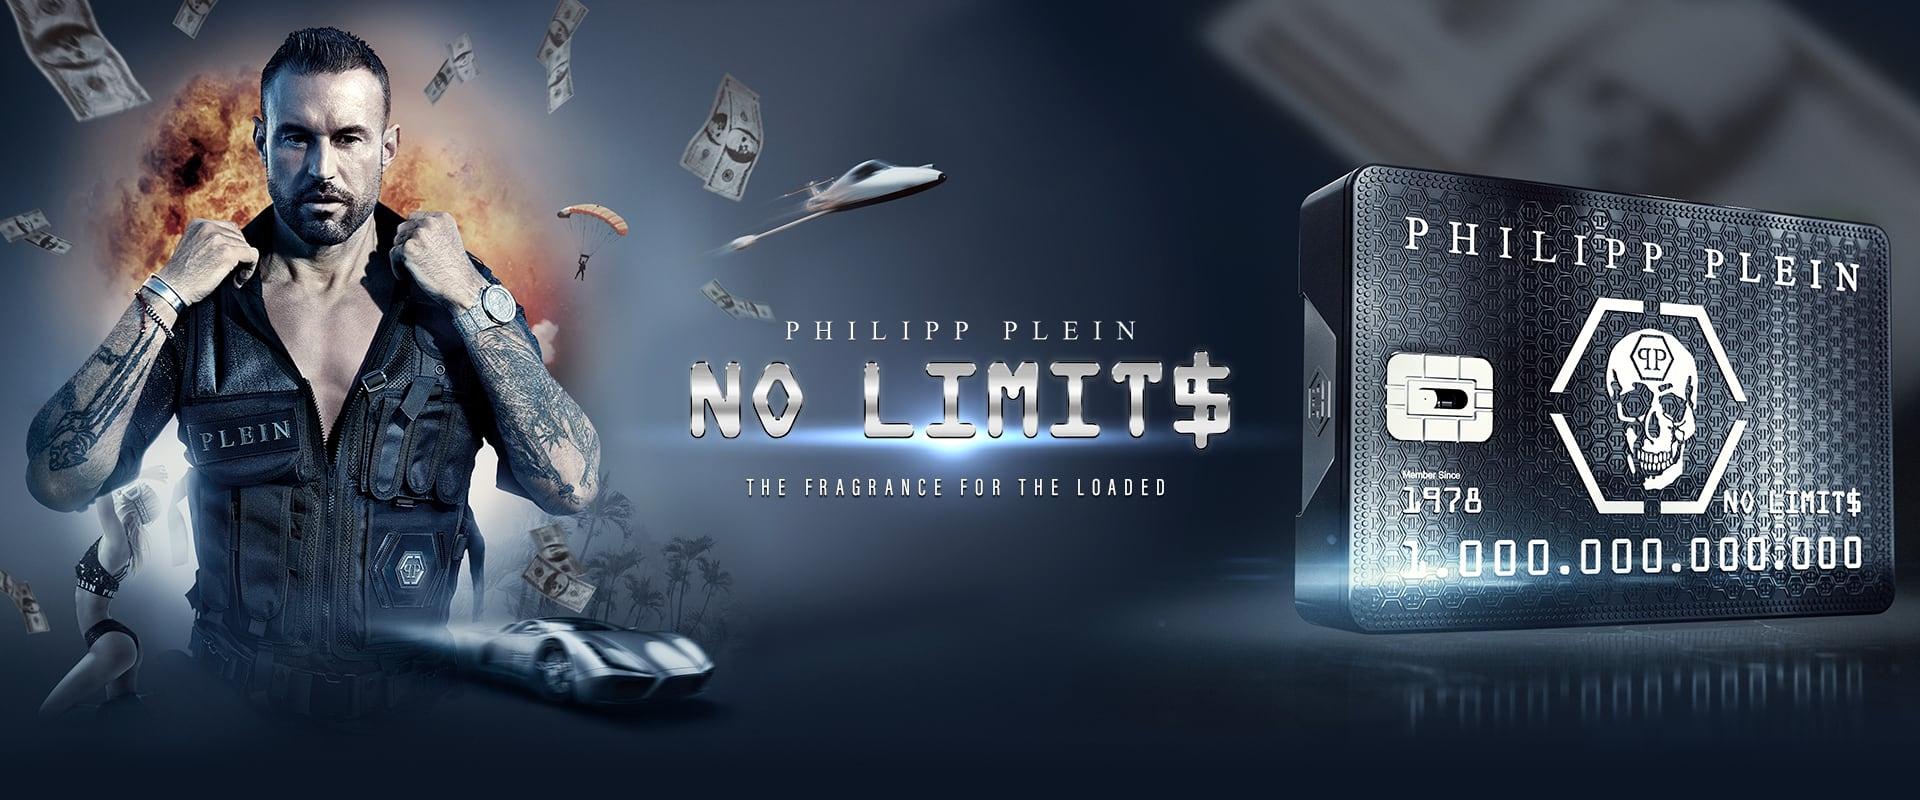 Philipp Plein parfum No limits